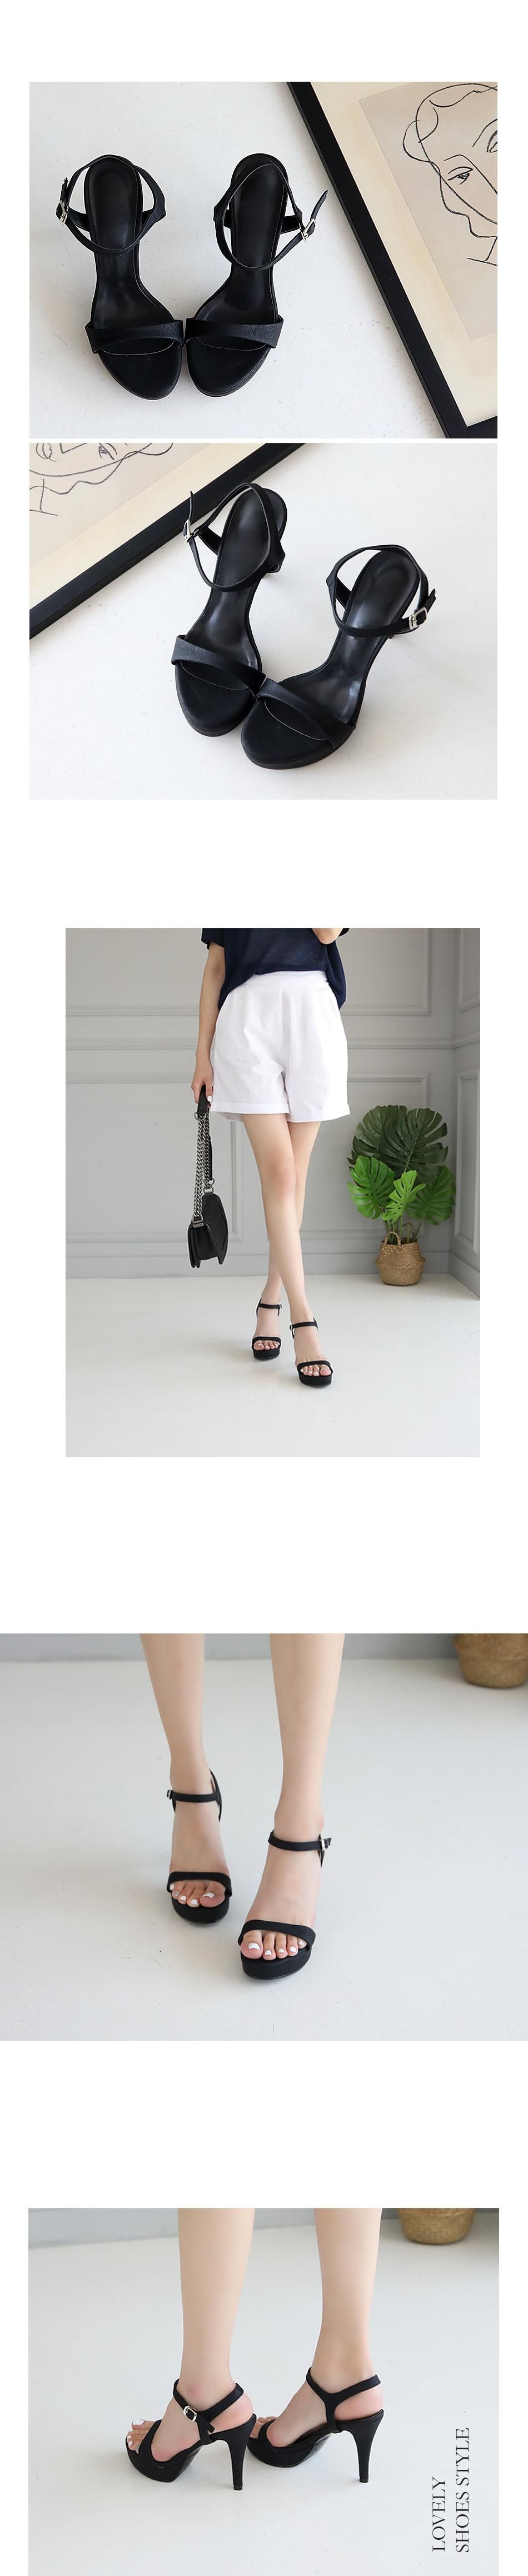 Lady Gauze strap sandals heel 10cm